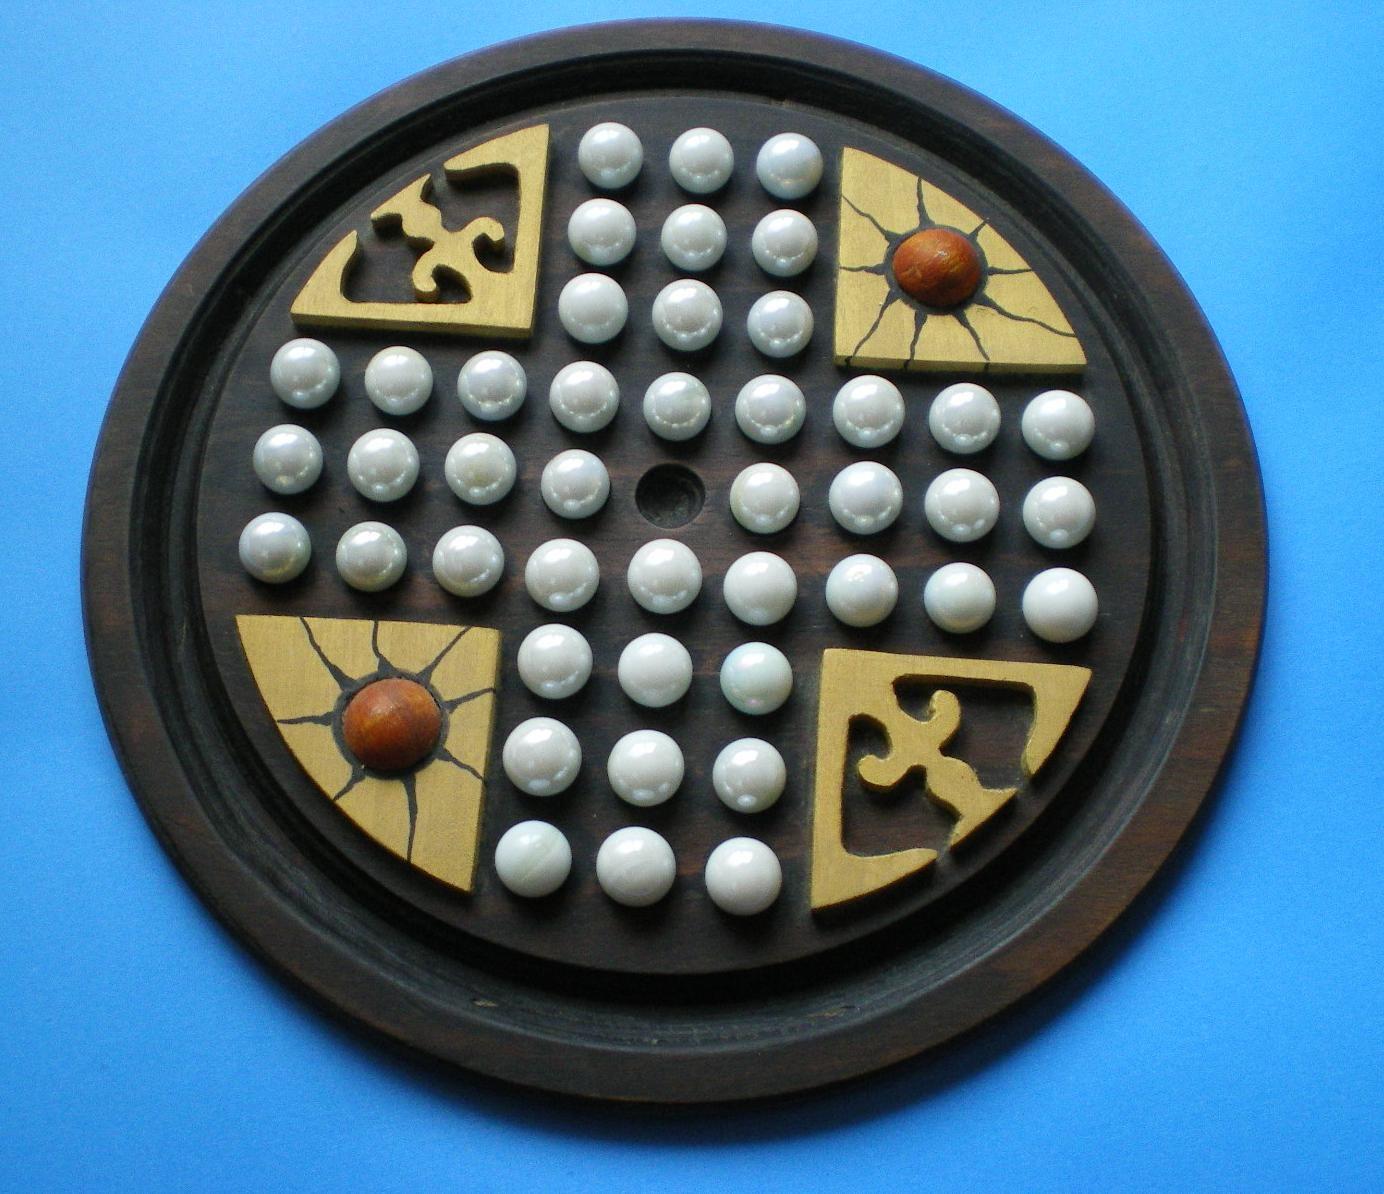 Wiegleb board Diy puzzles, Marble solitaire, Peg board